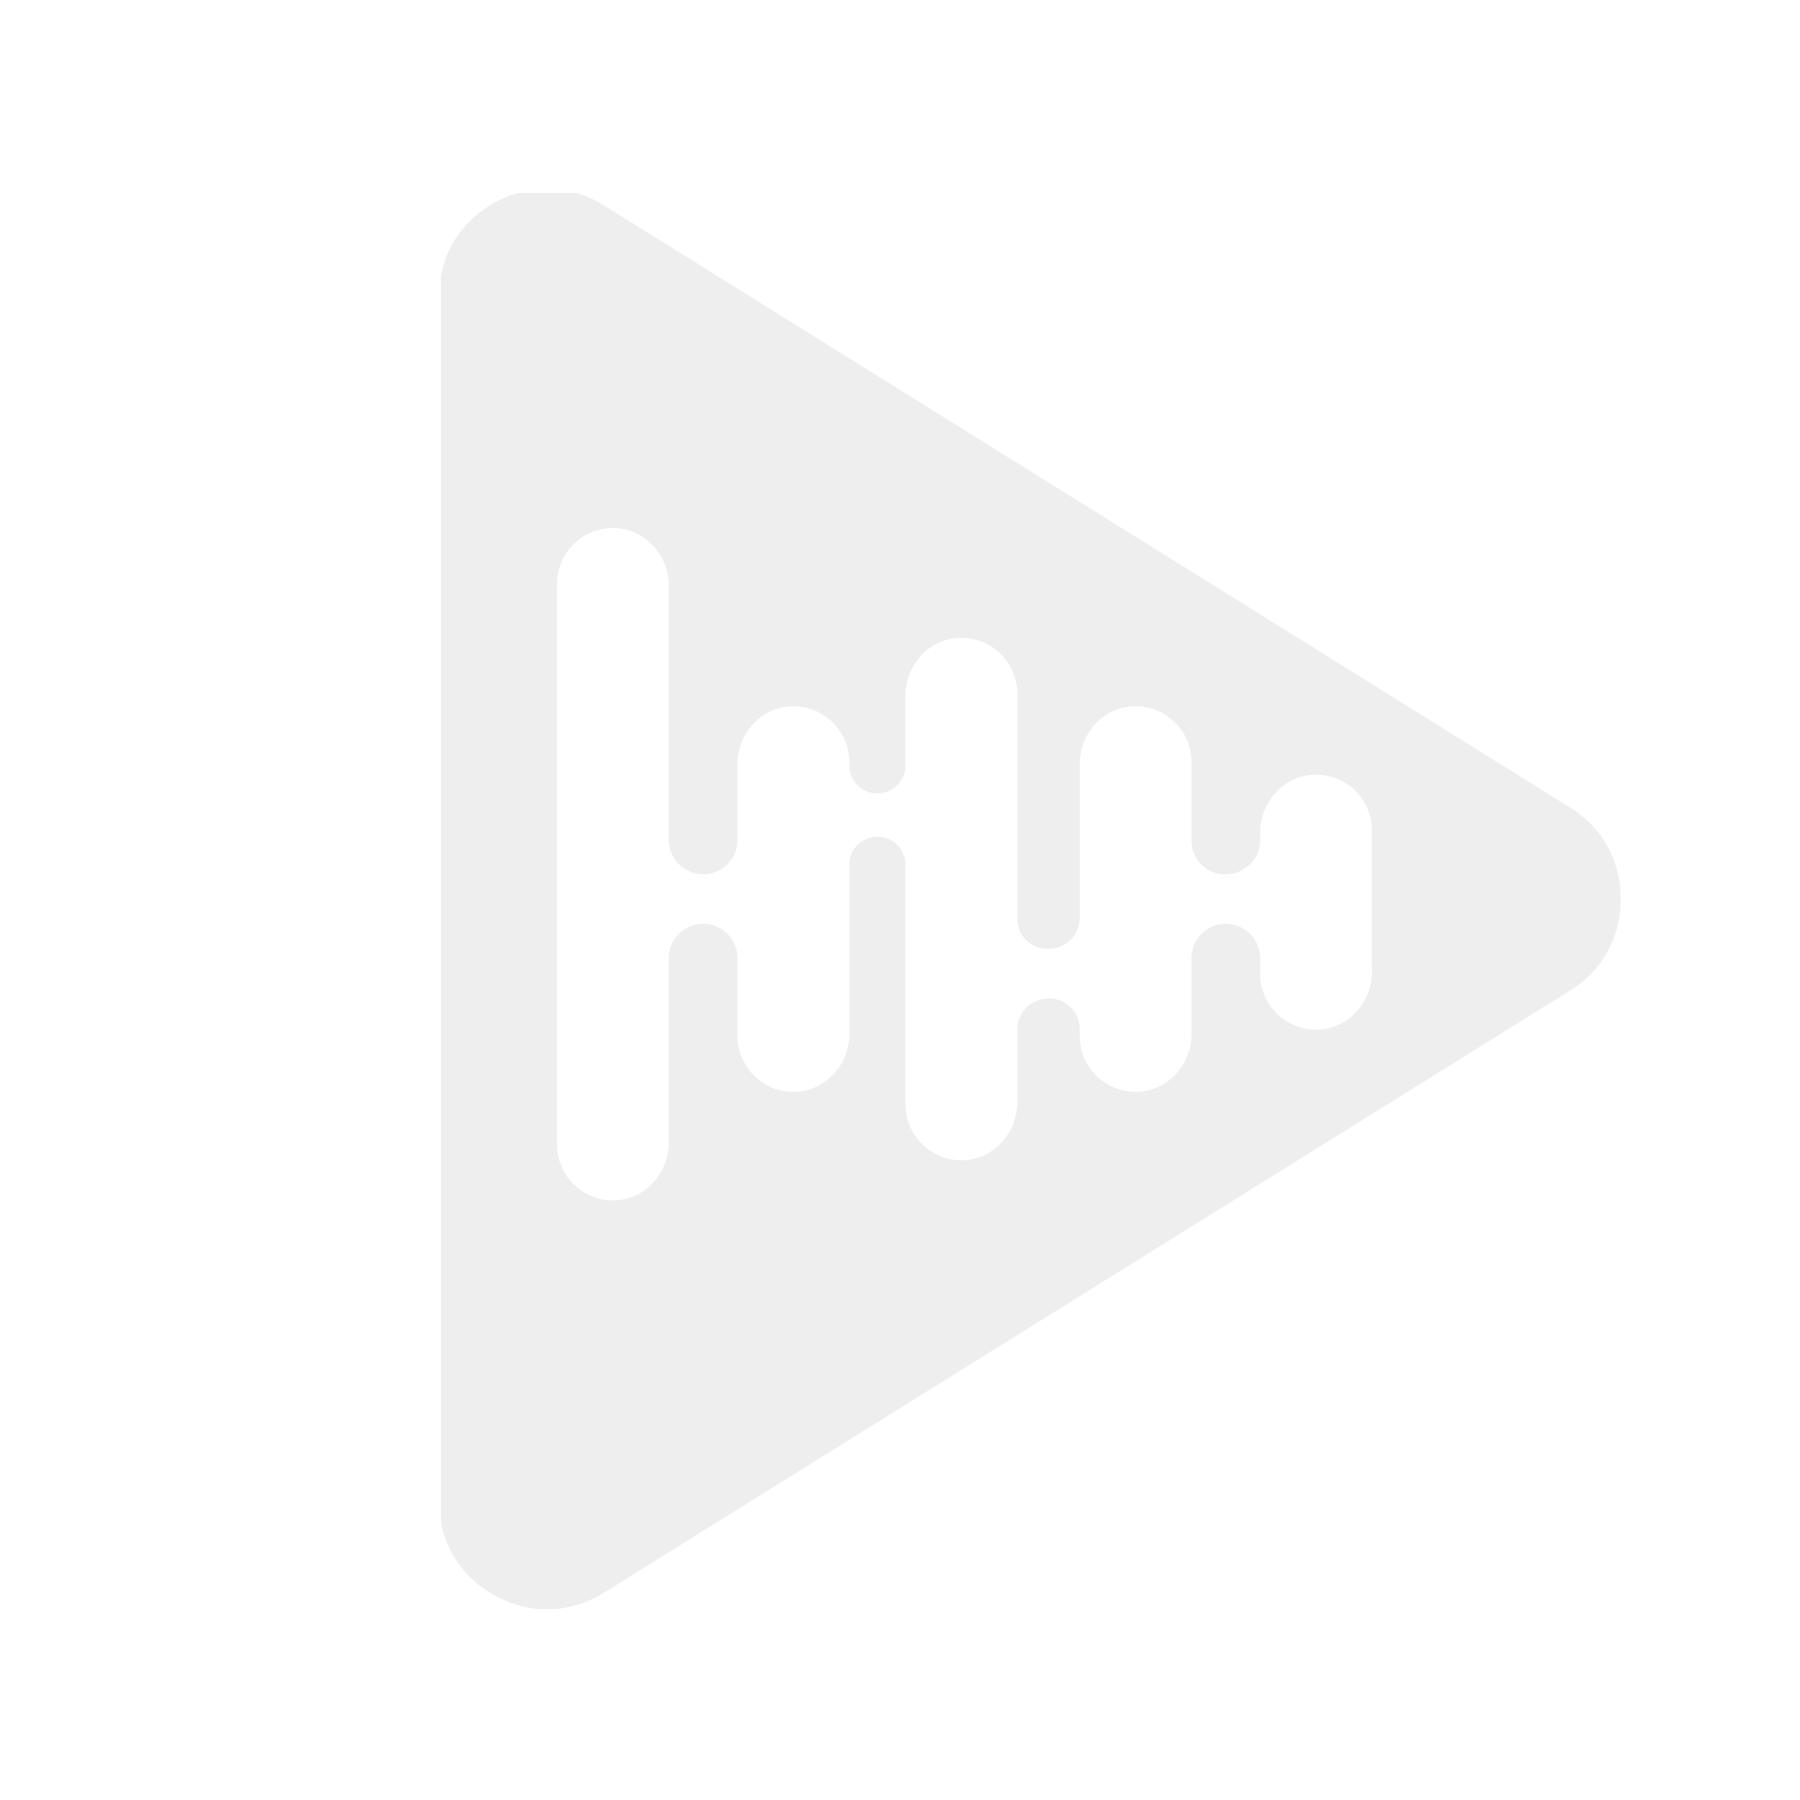 Audison APBMW-E93-HIFI